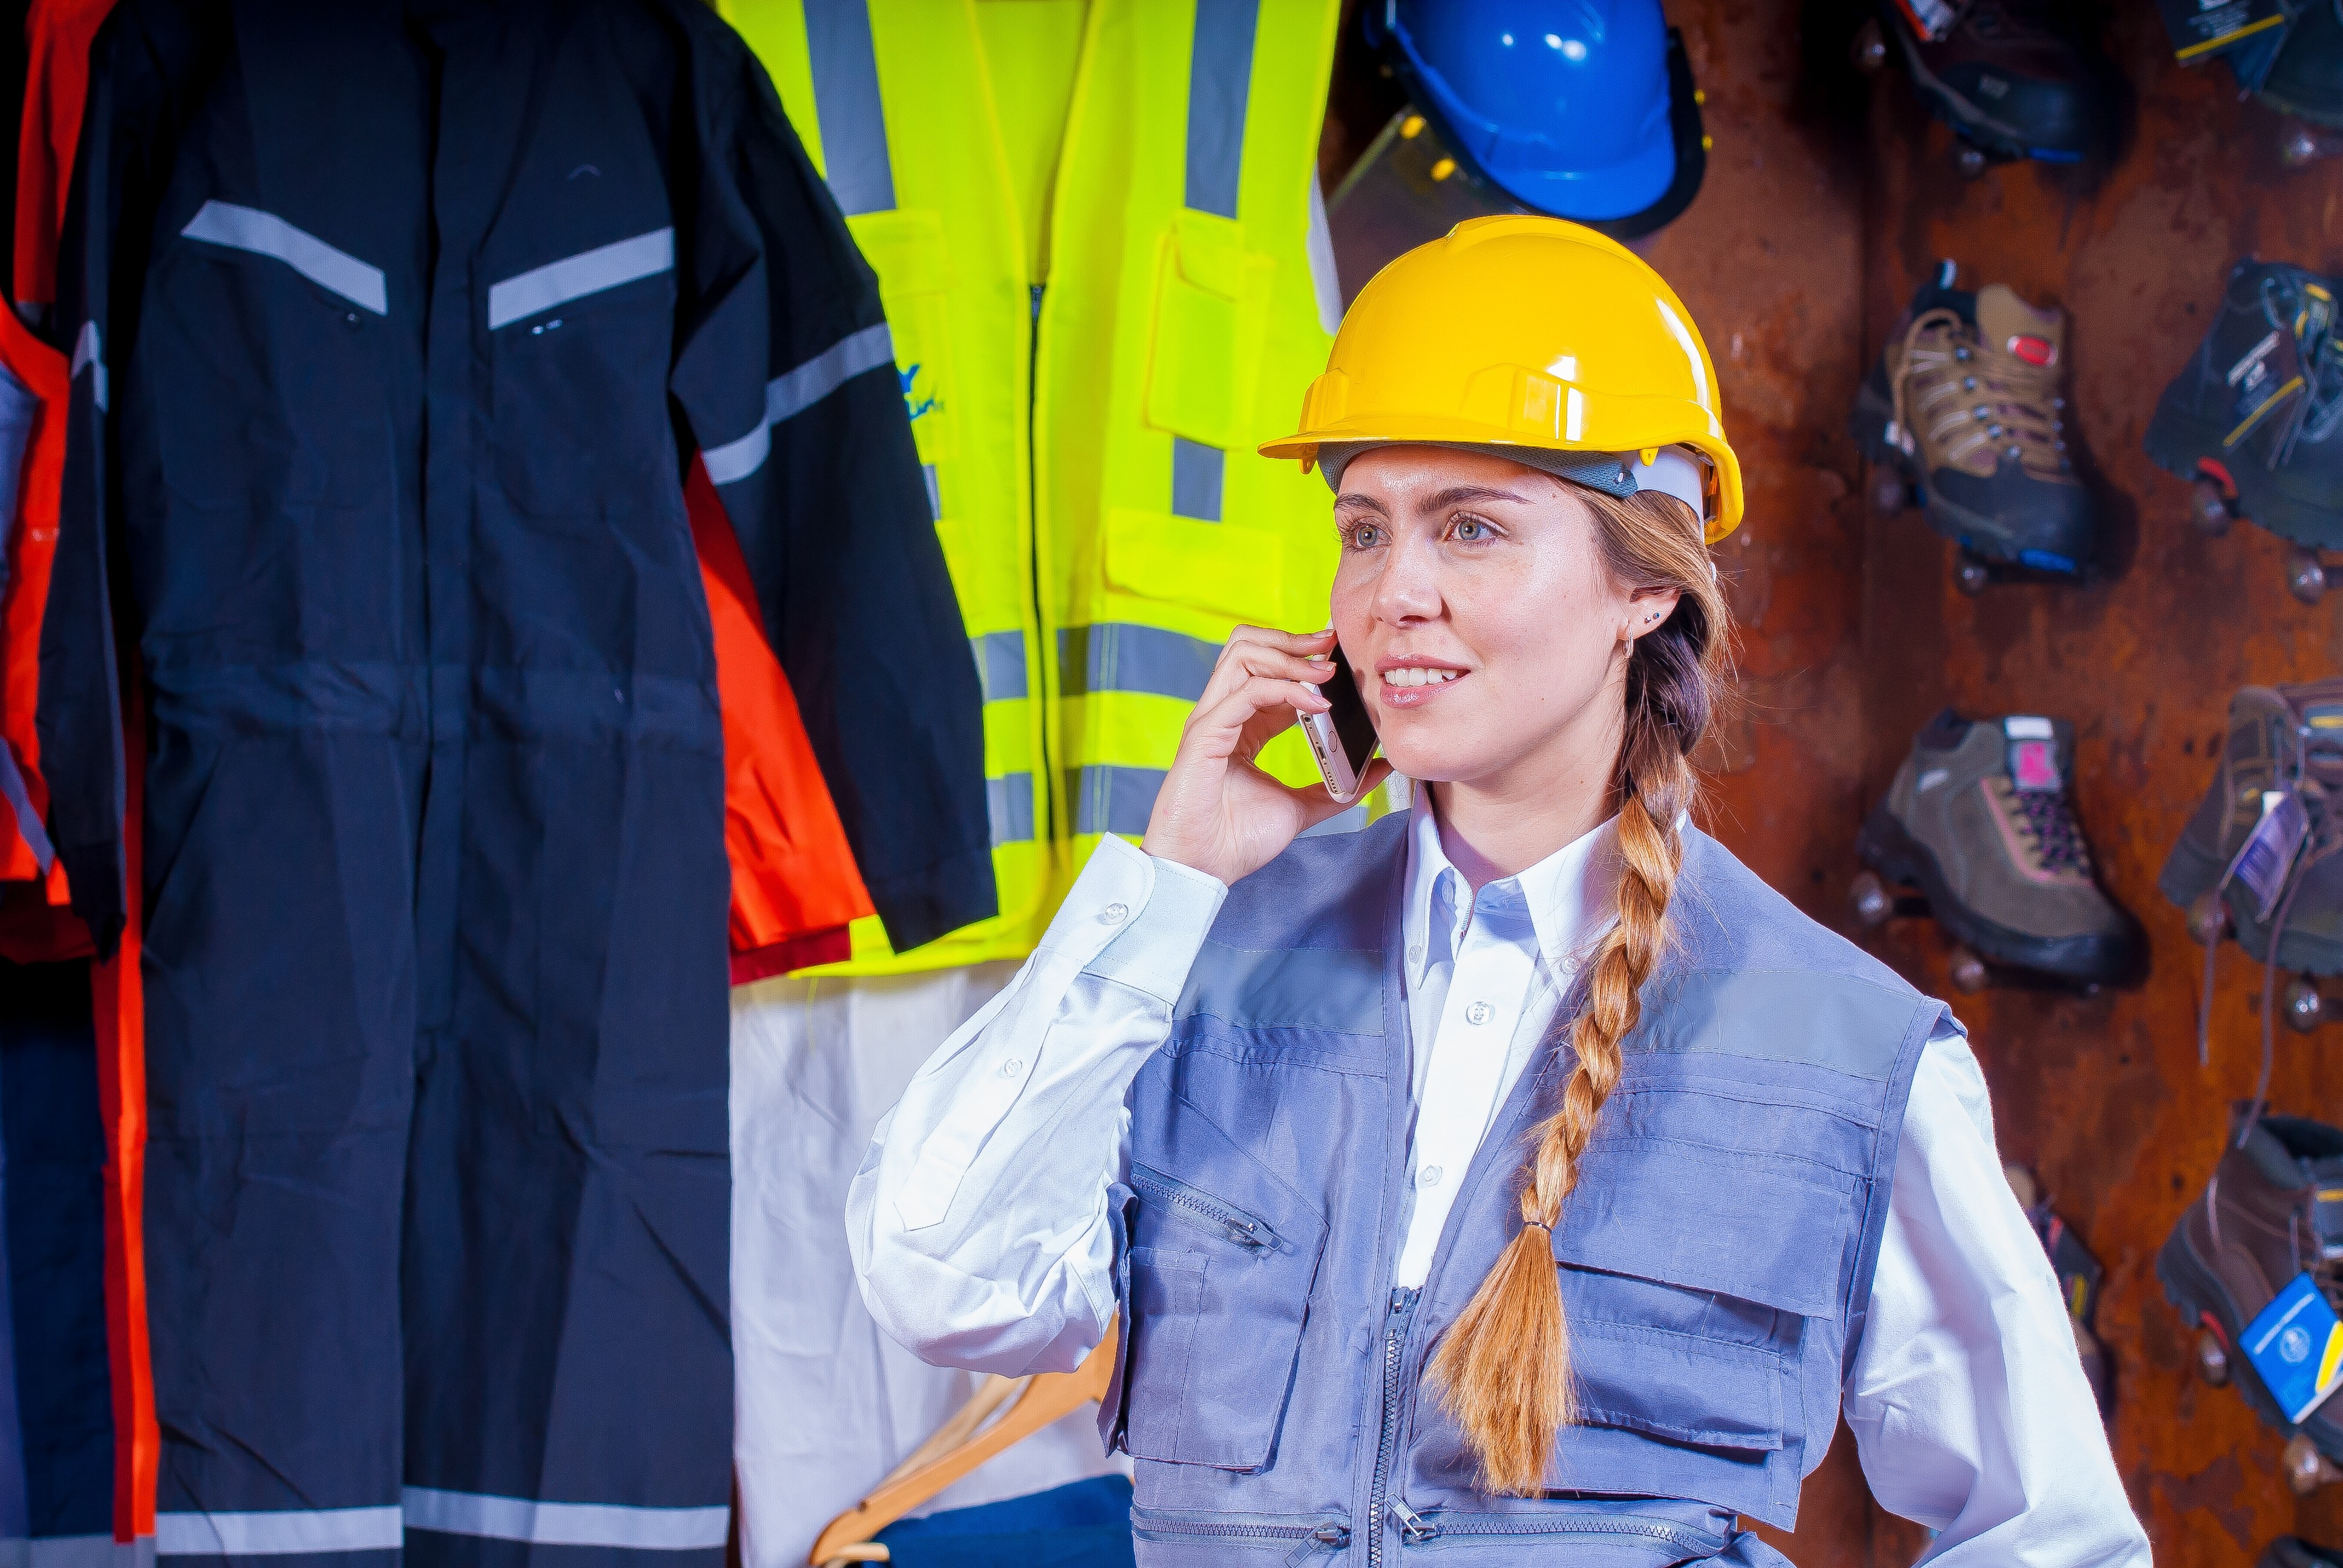 Construction Industry: Take Advantage of Savings This Tax Season